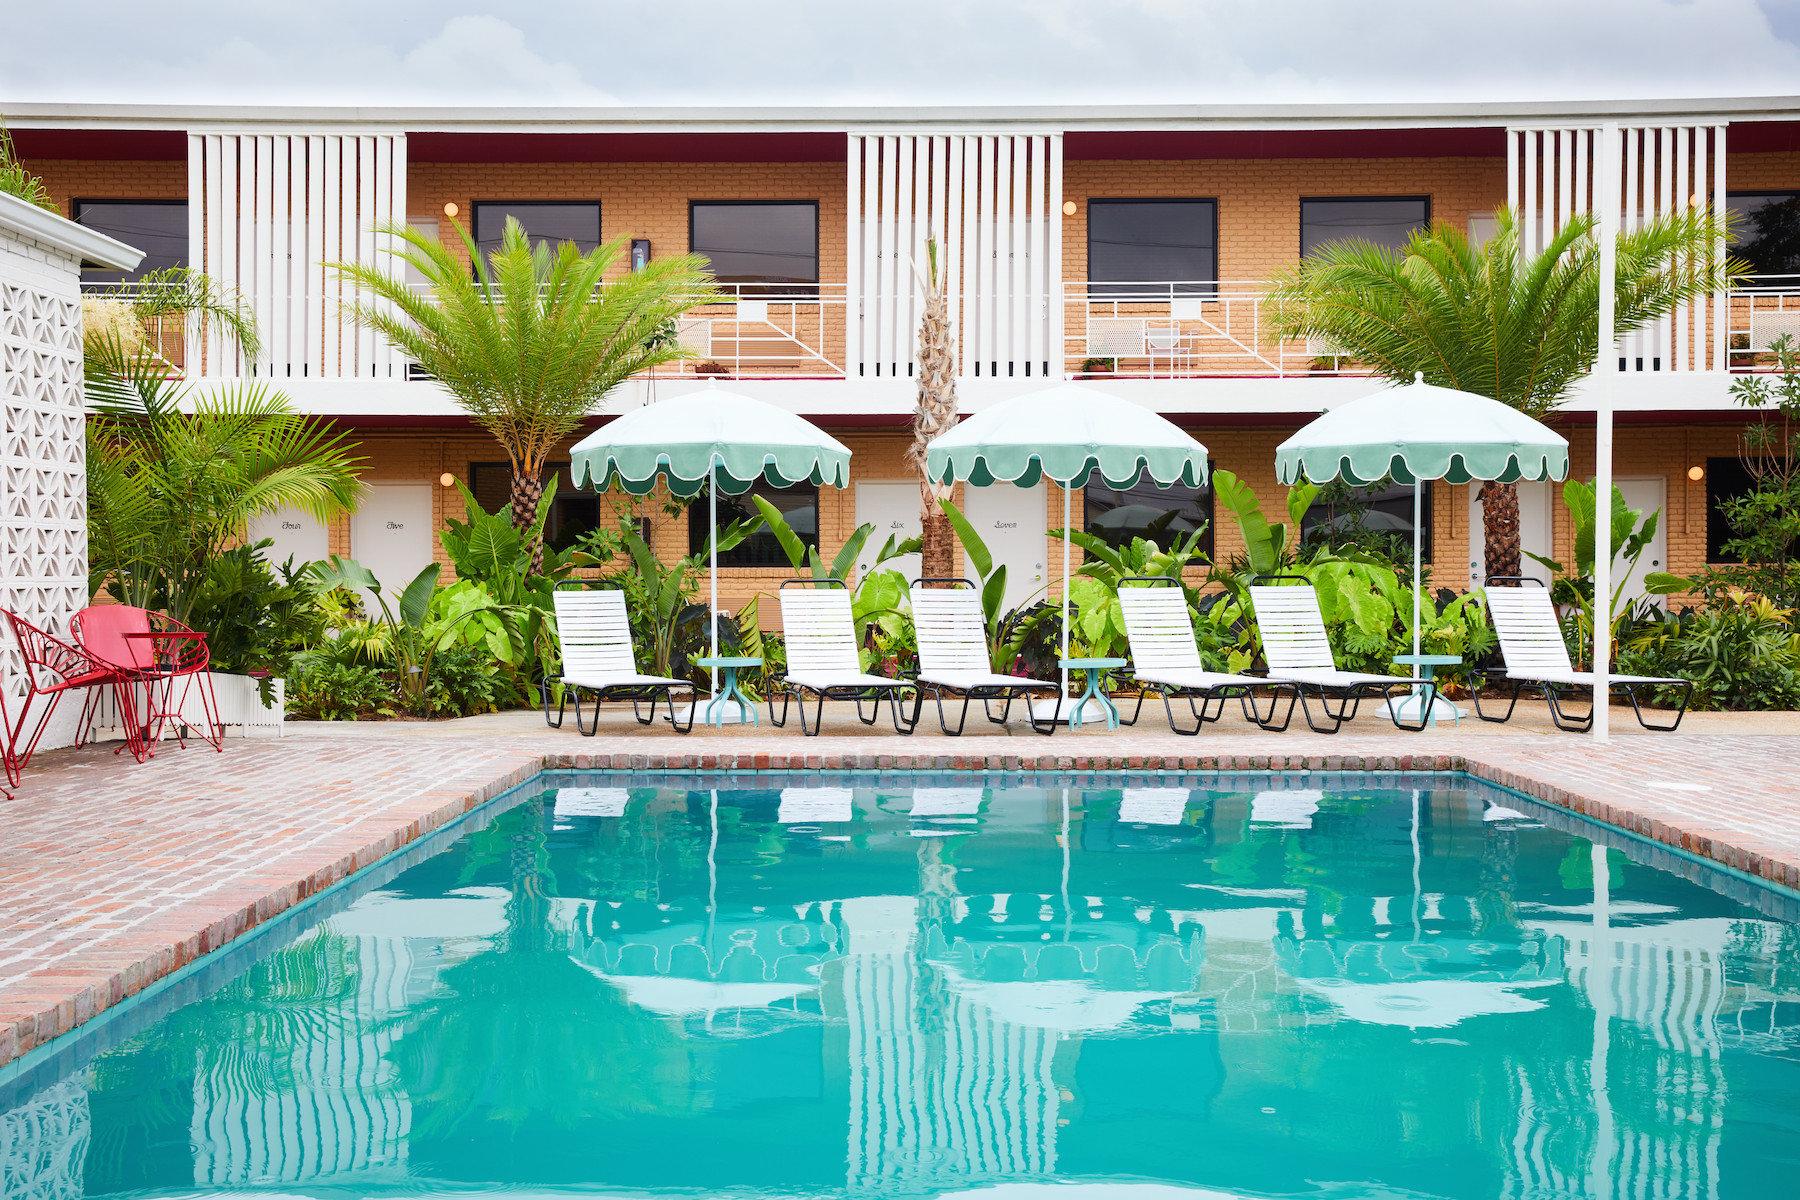 Boutique Hotels Hotels Luxury Travel building outdoor swimming pool Resort property leisure real estate estate Pool Villa hotel hacienda condominium vacation house palm tree backyard apartment amenity